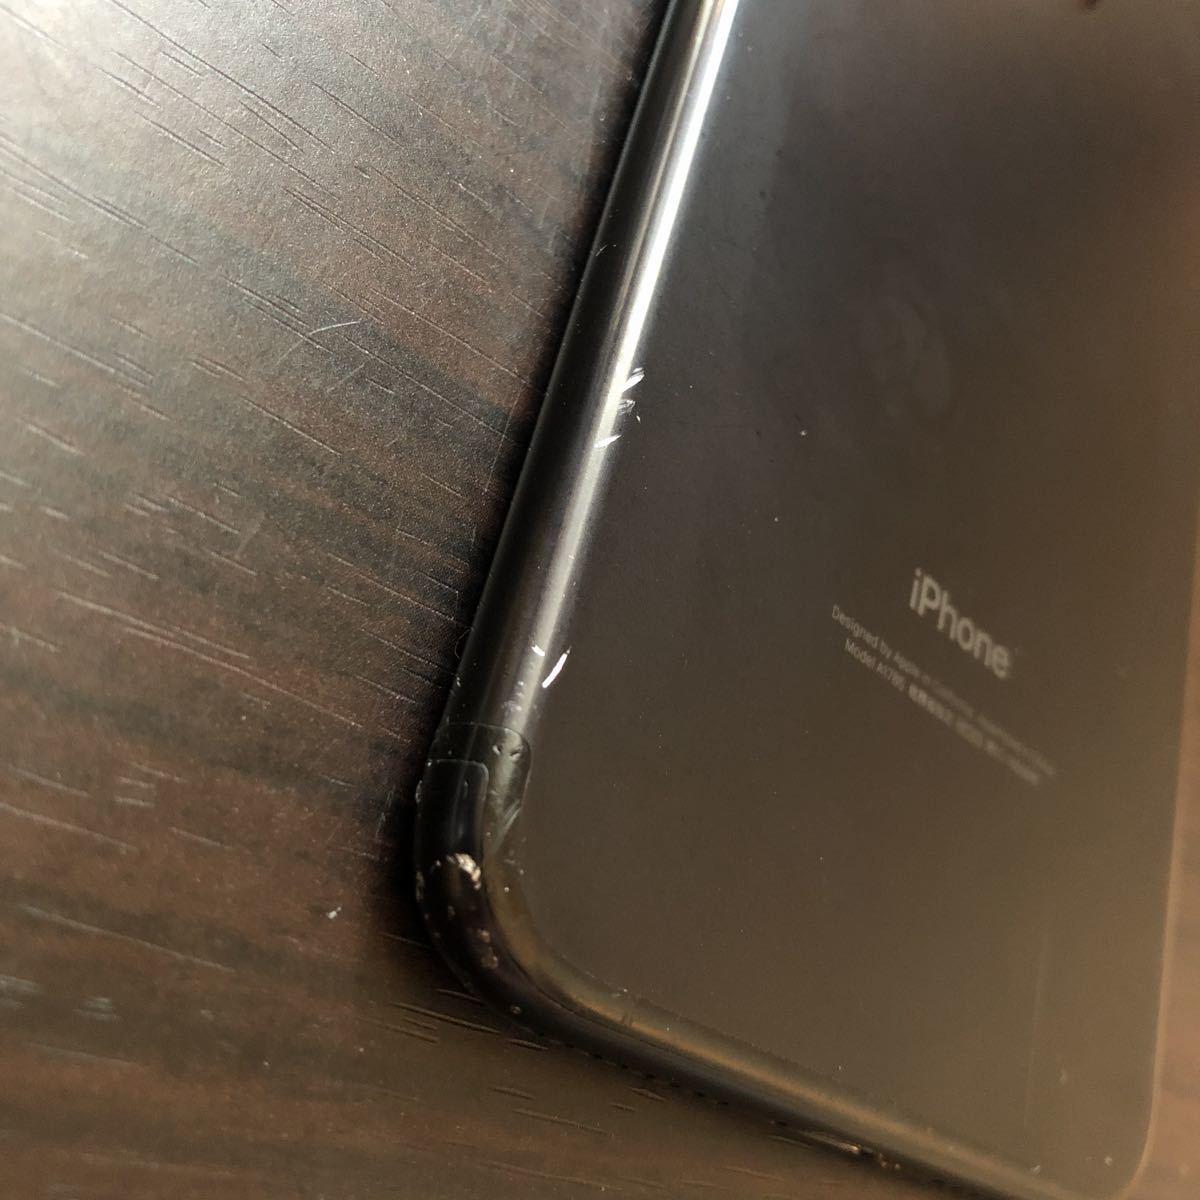 iPhone7Plus 256GB SIMフリー ブラック 中古良品 [1505]_画像3